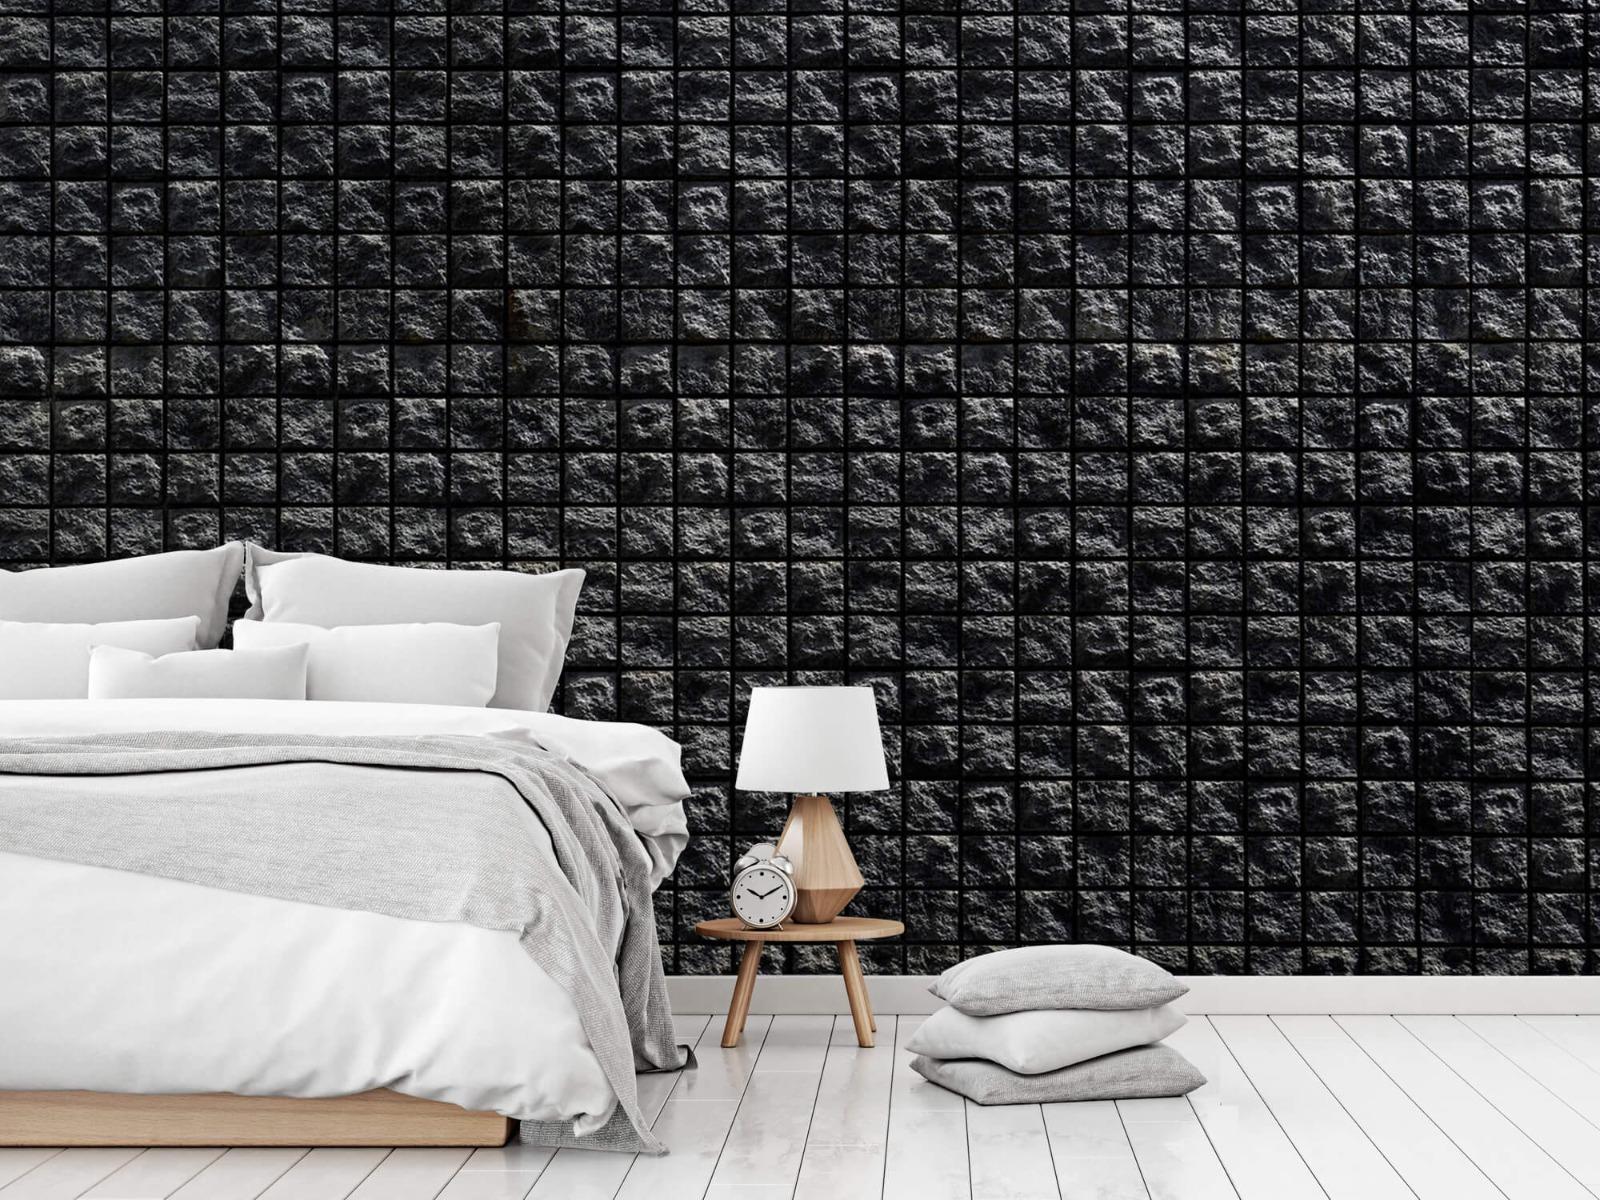 Tegel behang - Vierkante zwarte stenen - Wallexclusive - Woonkamer 14